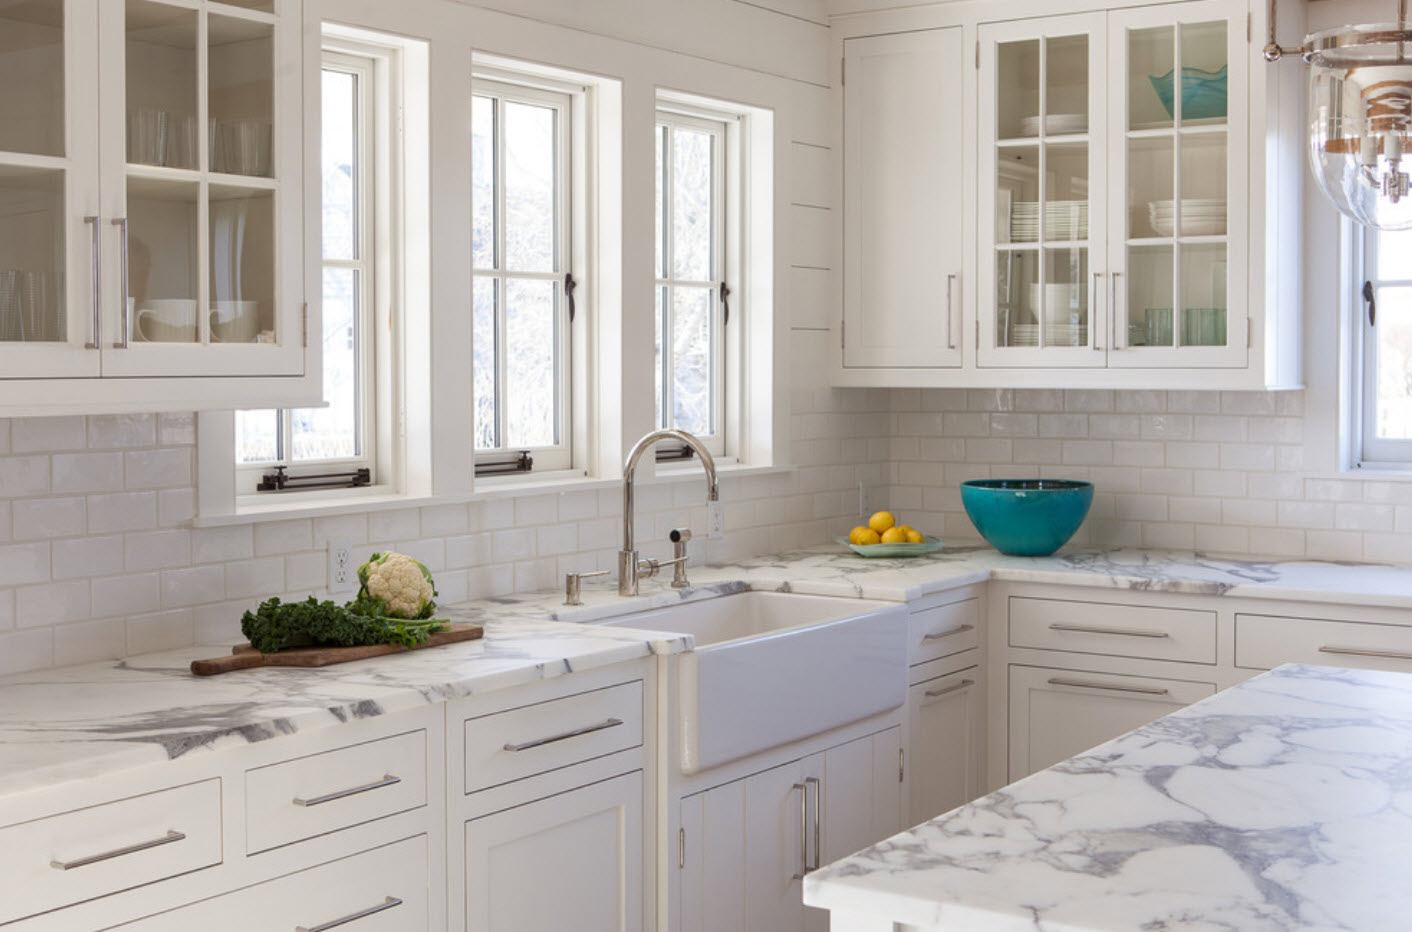 White kitchen with numerous windows and functional windowsill, sasj windows of kitchen cabinets